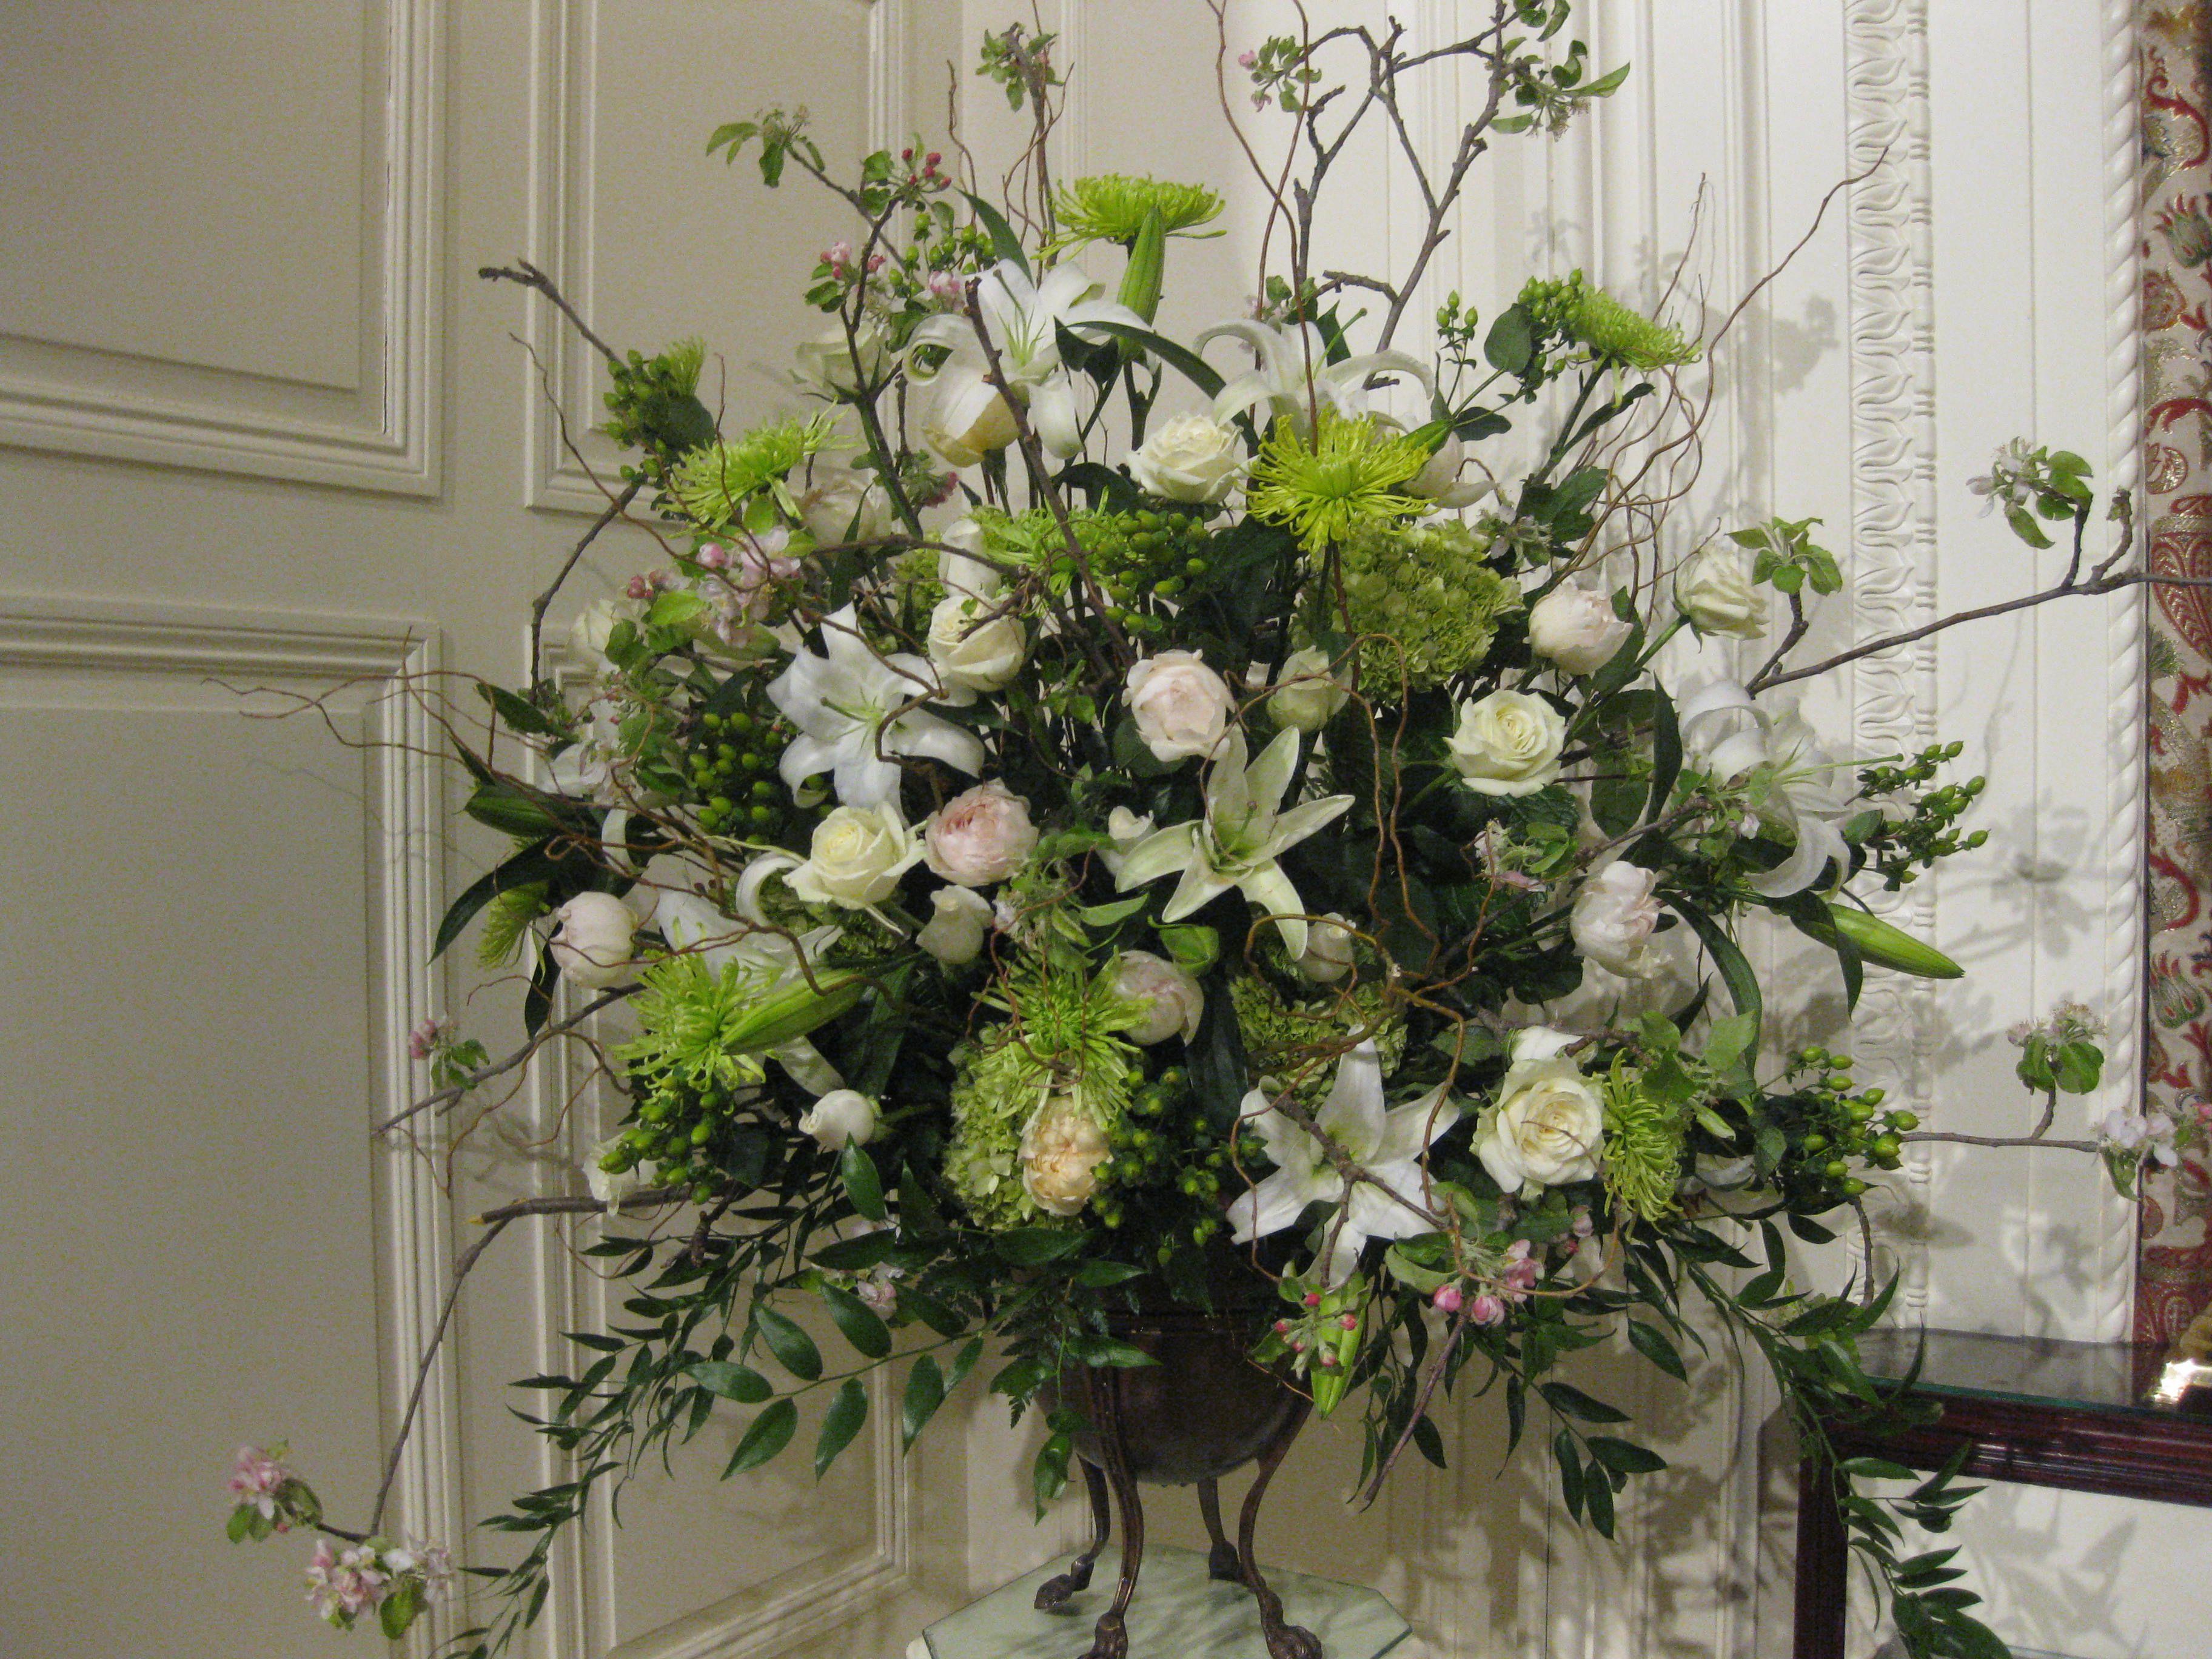 Ceremony Flowers By Twigs In Greenville Sc Flower Delivery Ceremony Flowers Order Flowers Online